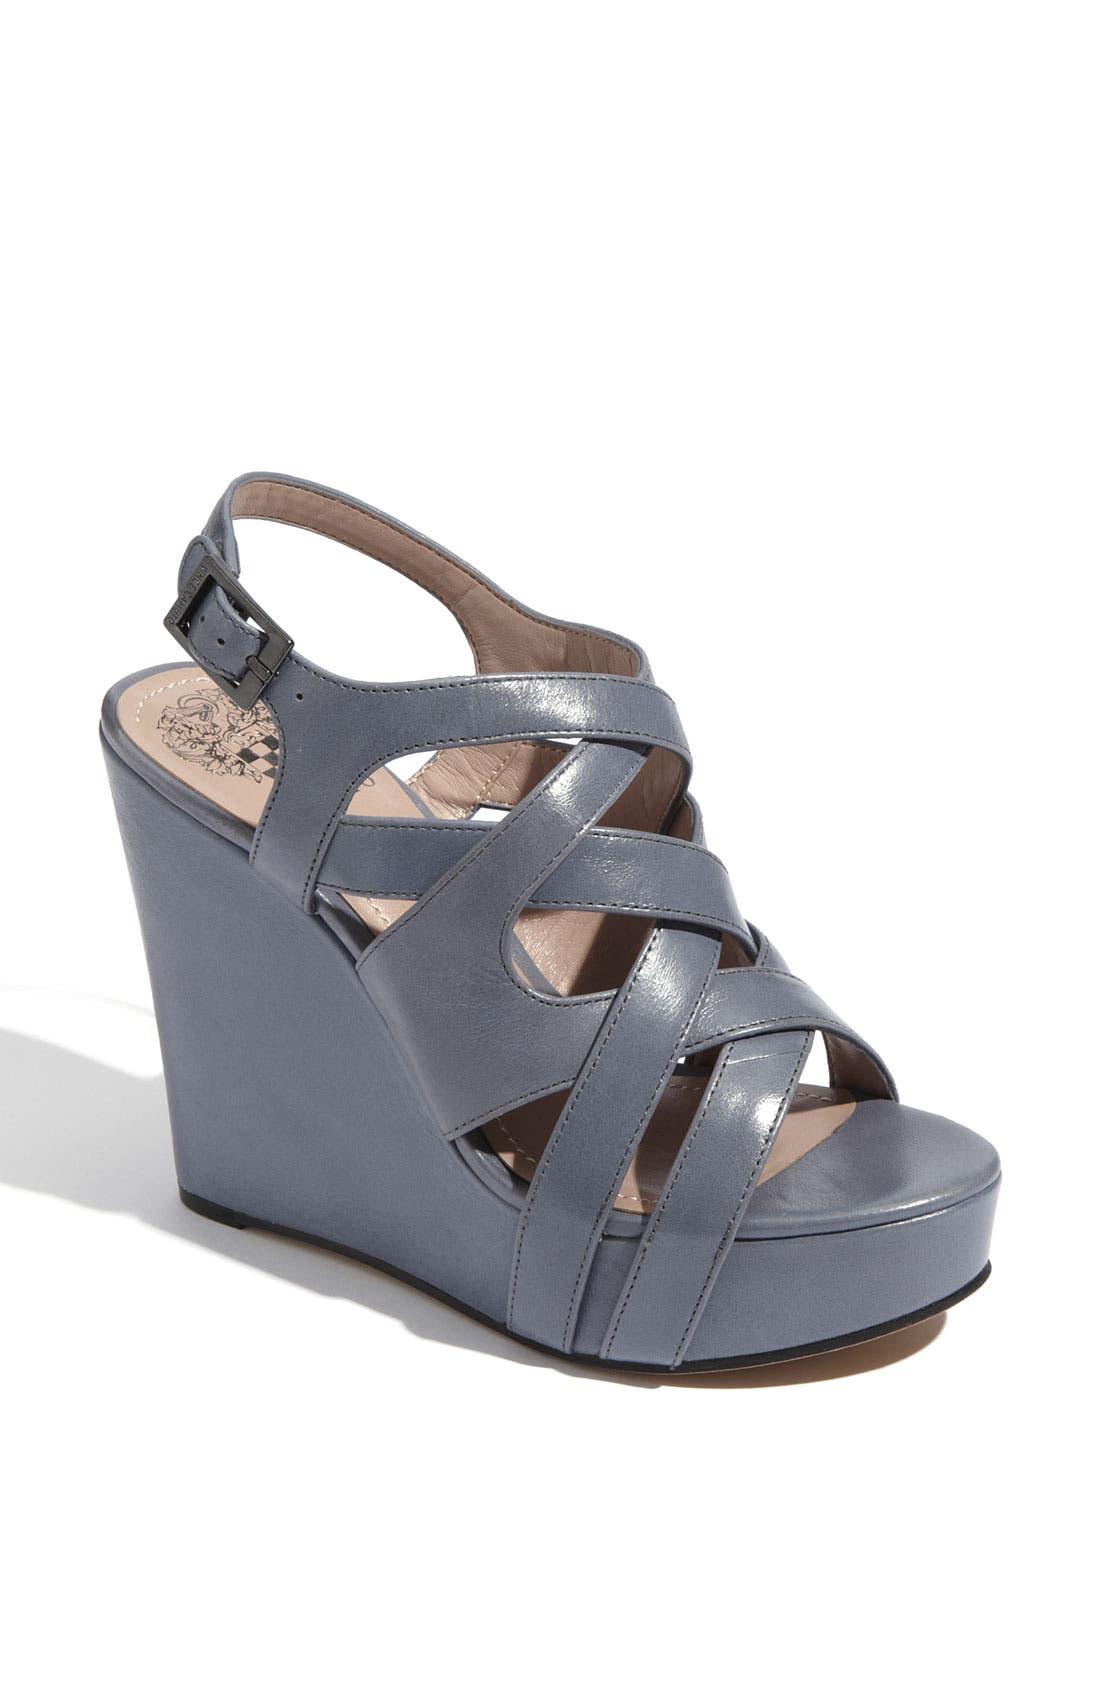 Alternate Image 1 Selected - Vince Camuto 'Shivona' Sandal